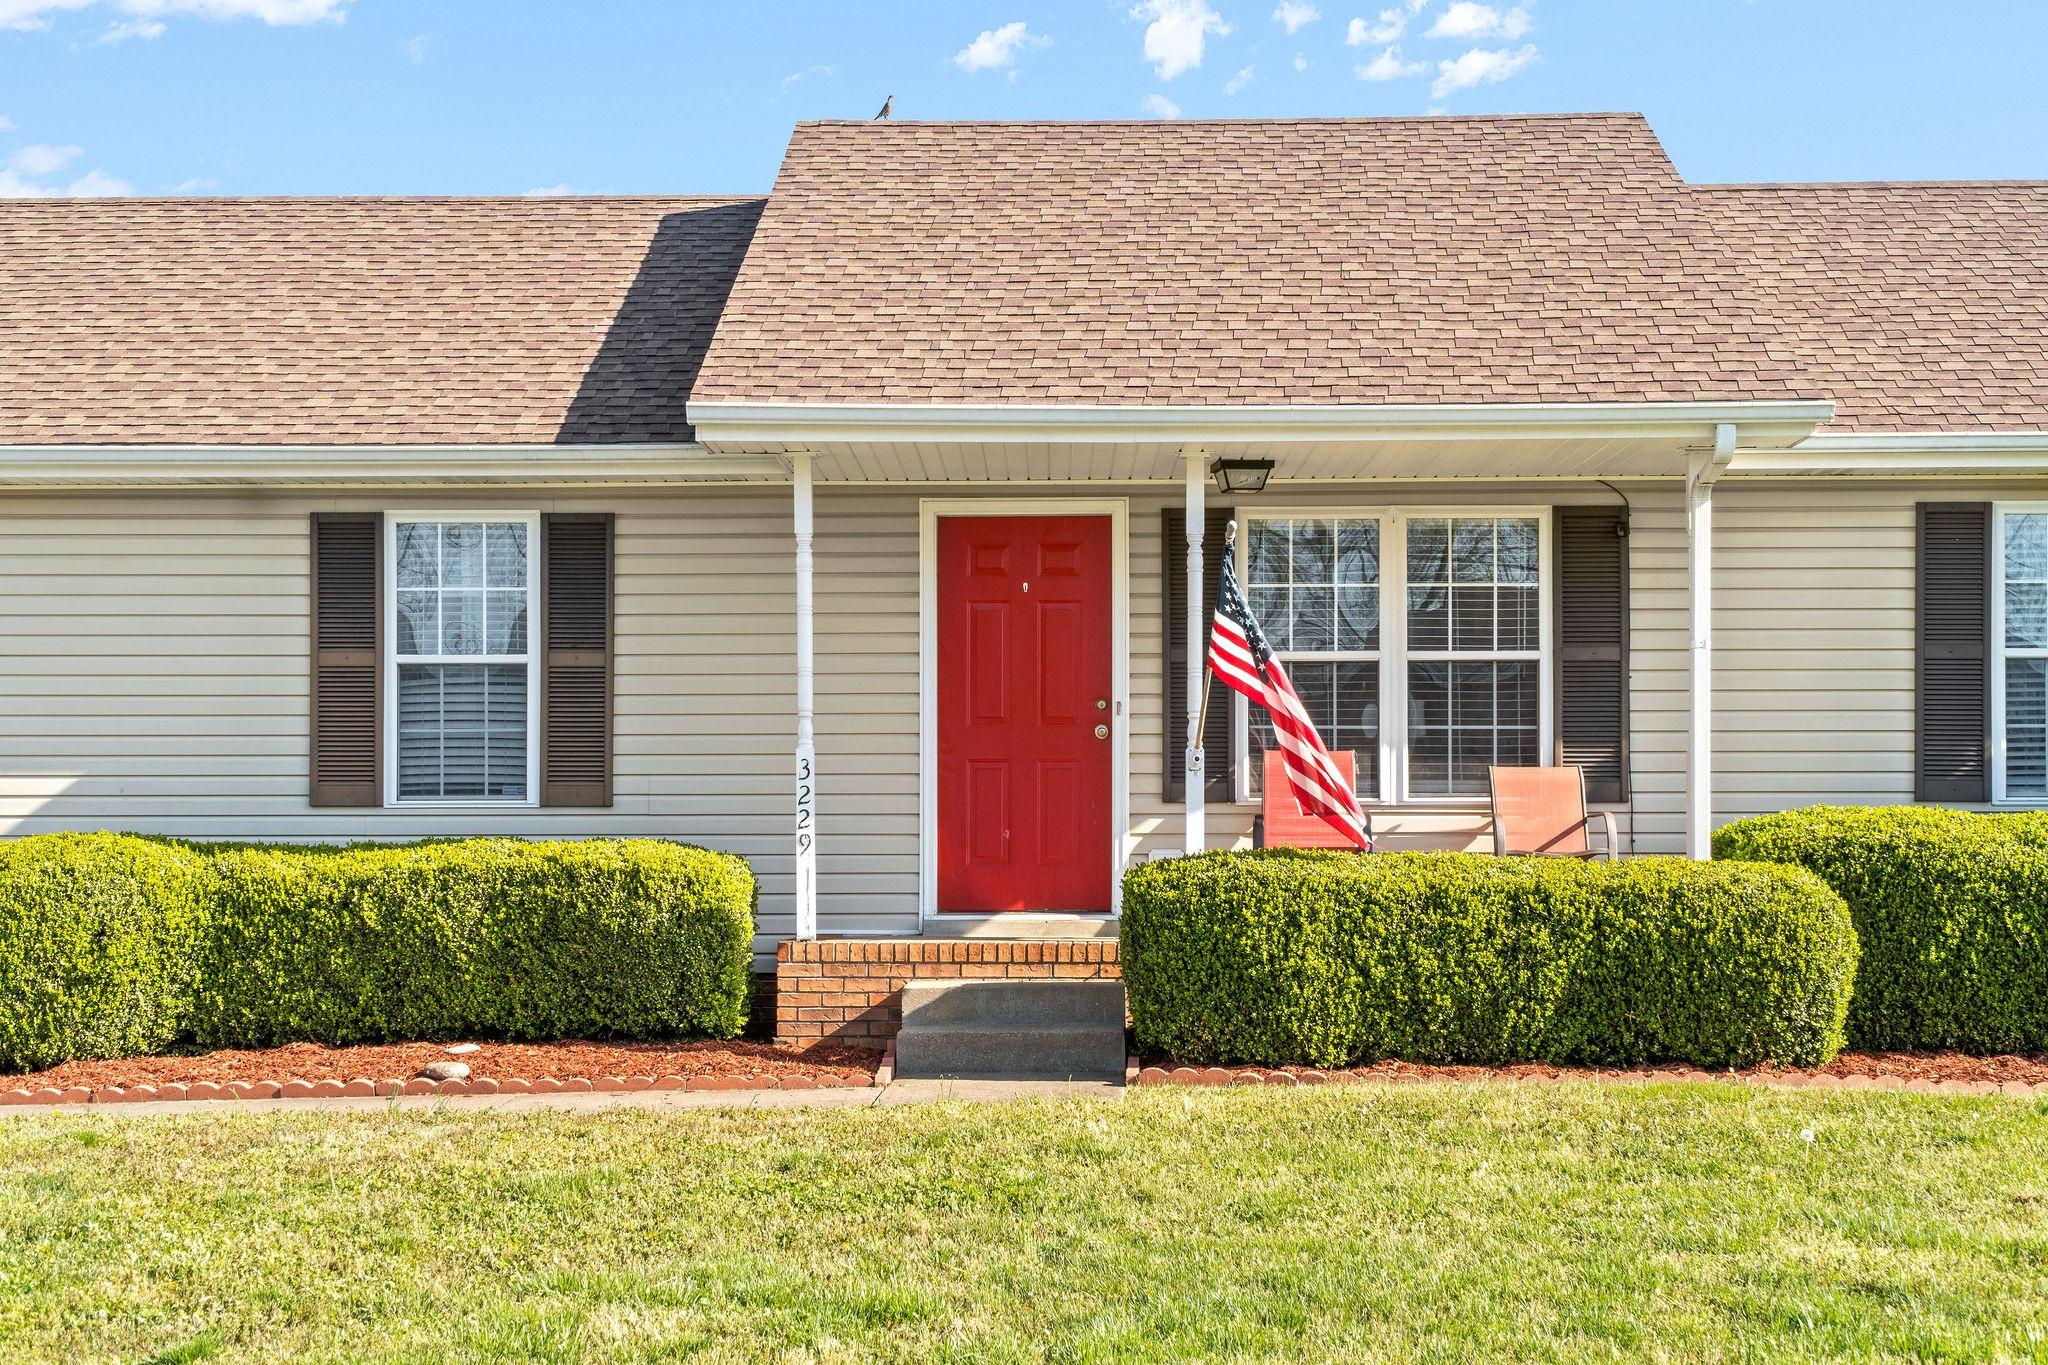 3229 S Senseney Cir Property Photo - Clarksville, TN real estate listing